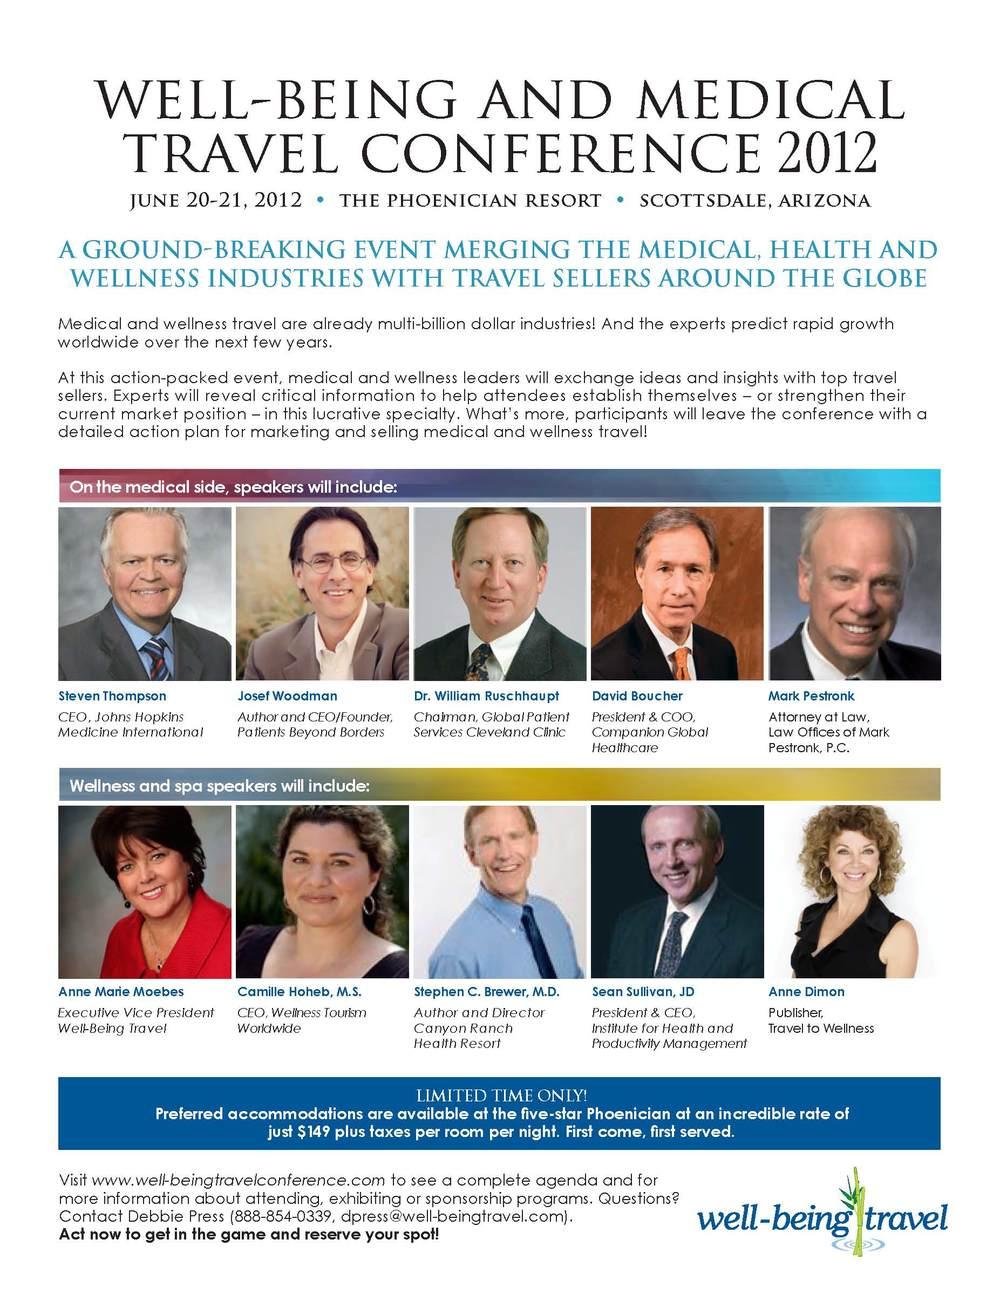 Well-Being Conference FlyerJPEG.jpg